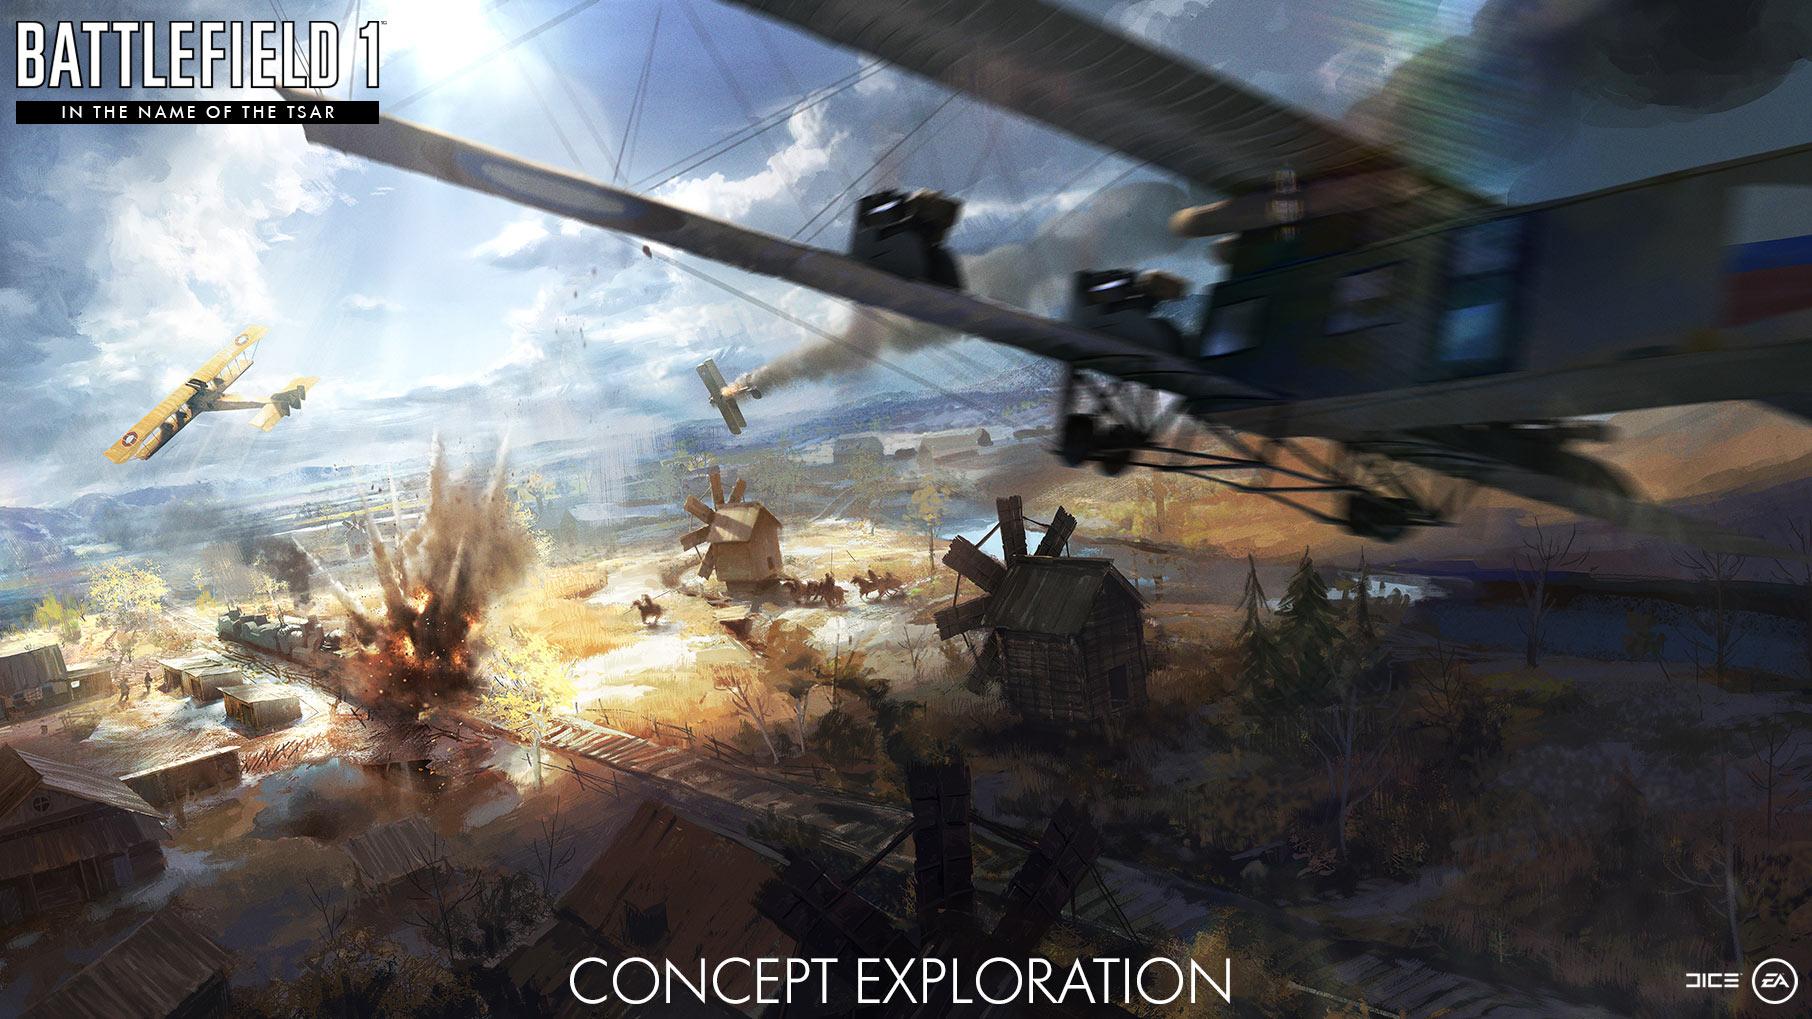 https://media-www-battlefieldwebcore.spark.ea.com/content/battlefield-portal/fr_FR/games/battlefield-1/in-the-name-of-the-tsar/_jcr_content/par/section_0/columns/column/content/editorial_1/image/large.img.jpg